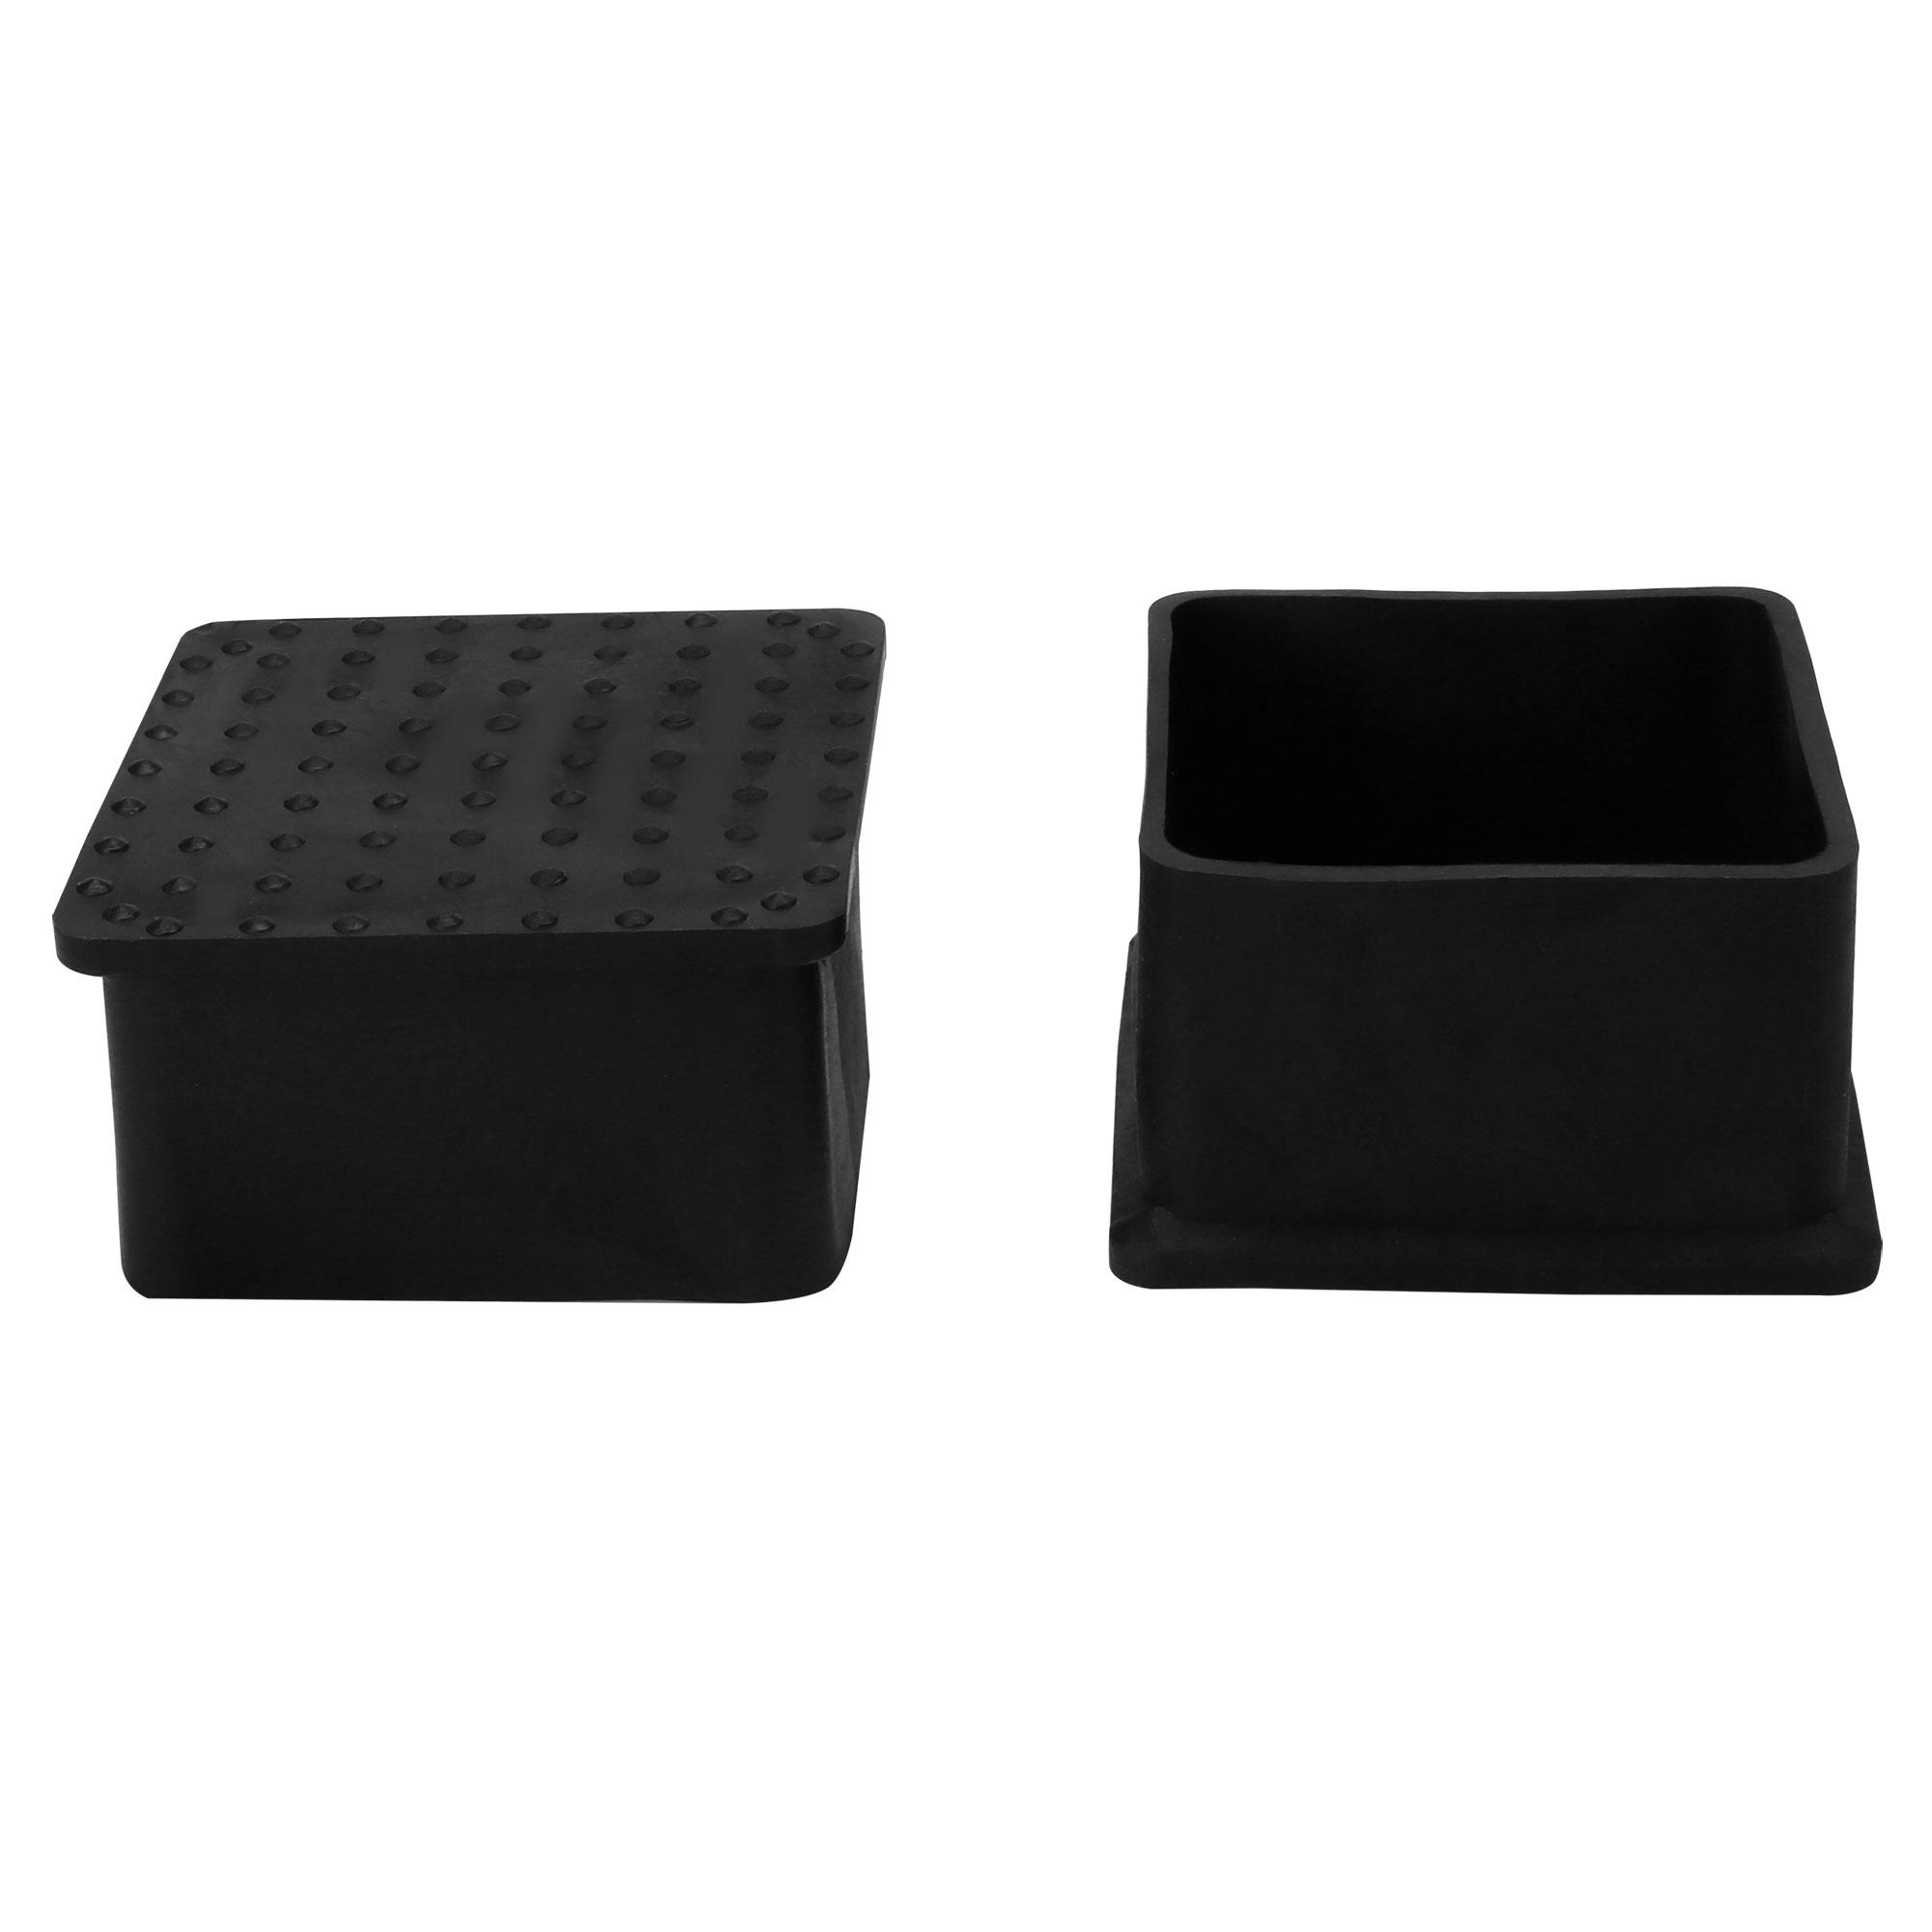 "Desk Table Leg Caps End Tip Home Furniture Protector 30pcs 2""x2"" (50x50mm) - image 7 de 7"